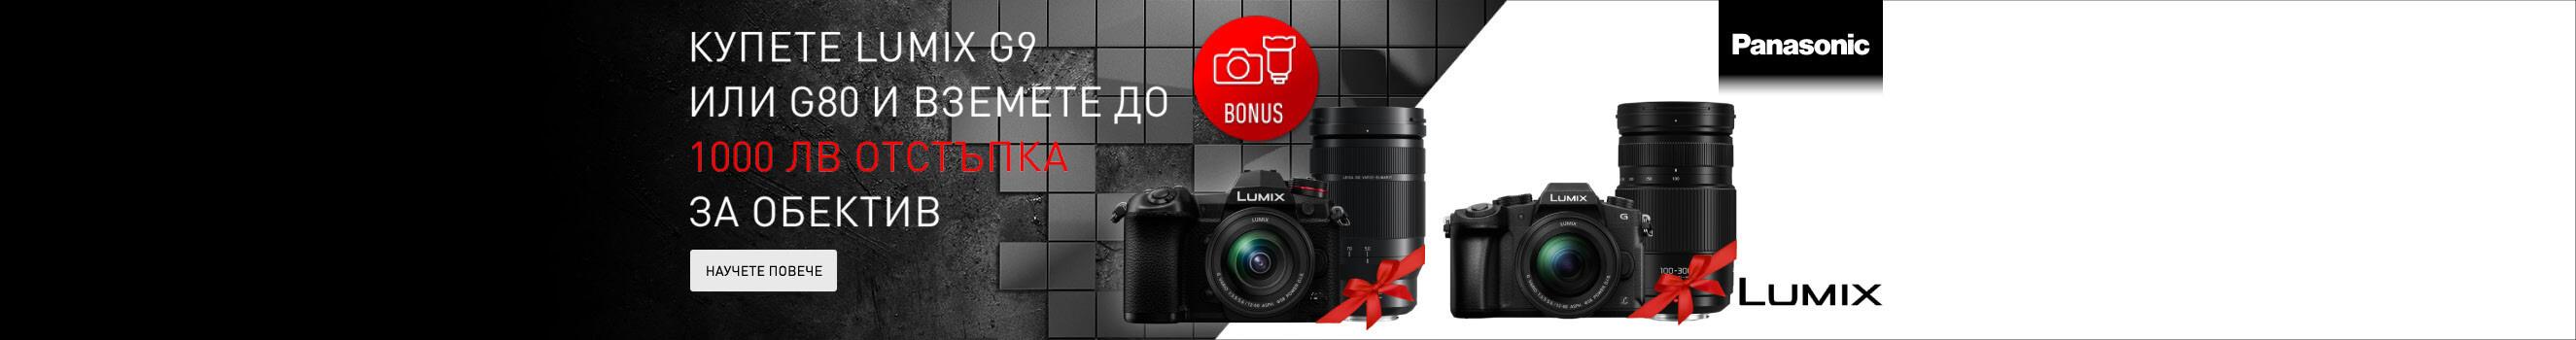 Fujifilm Instax mini 9 Моменталният Подарък 4 в 1